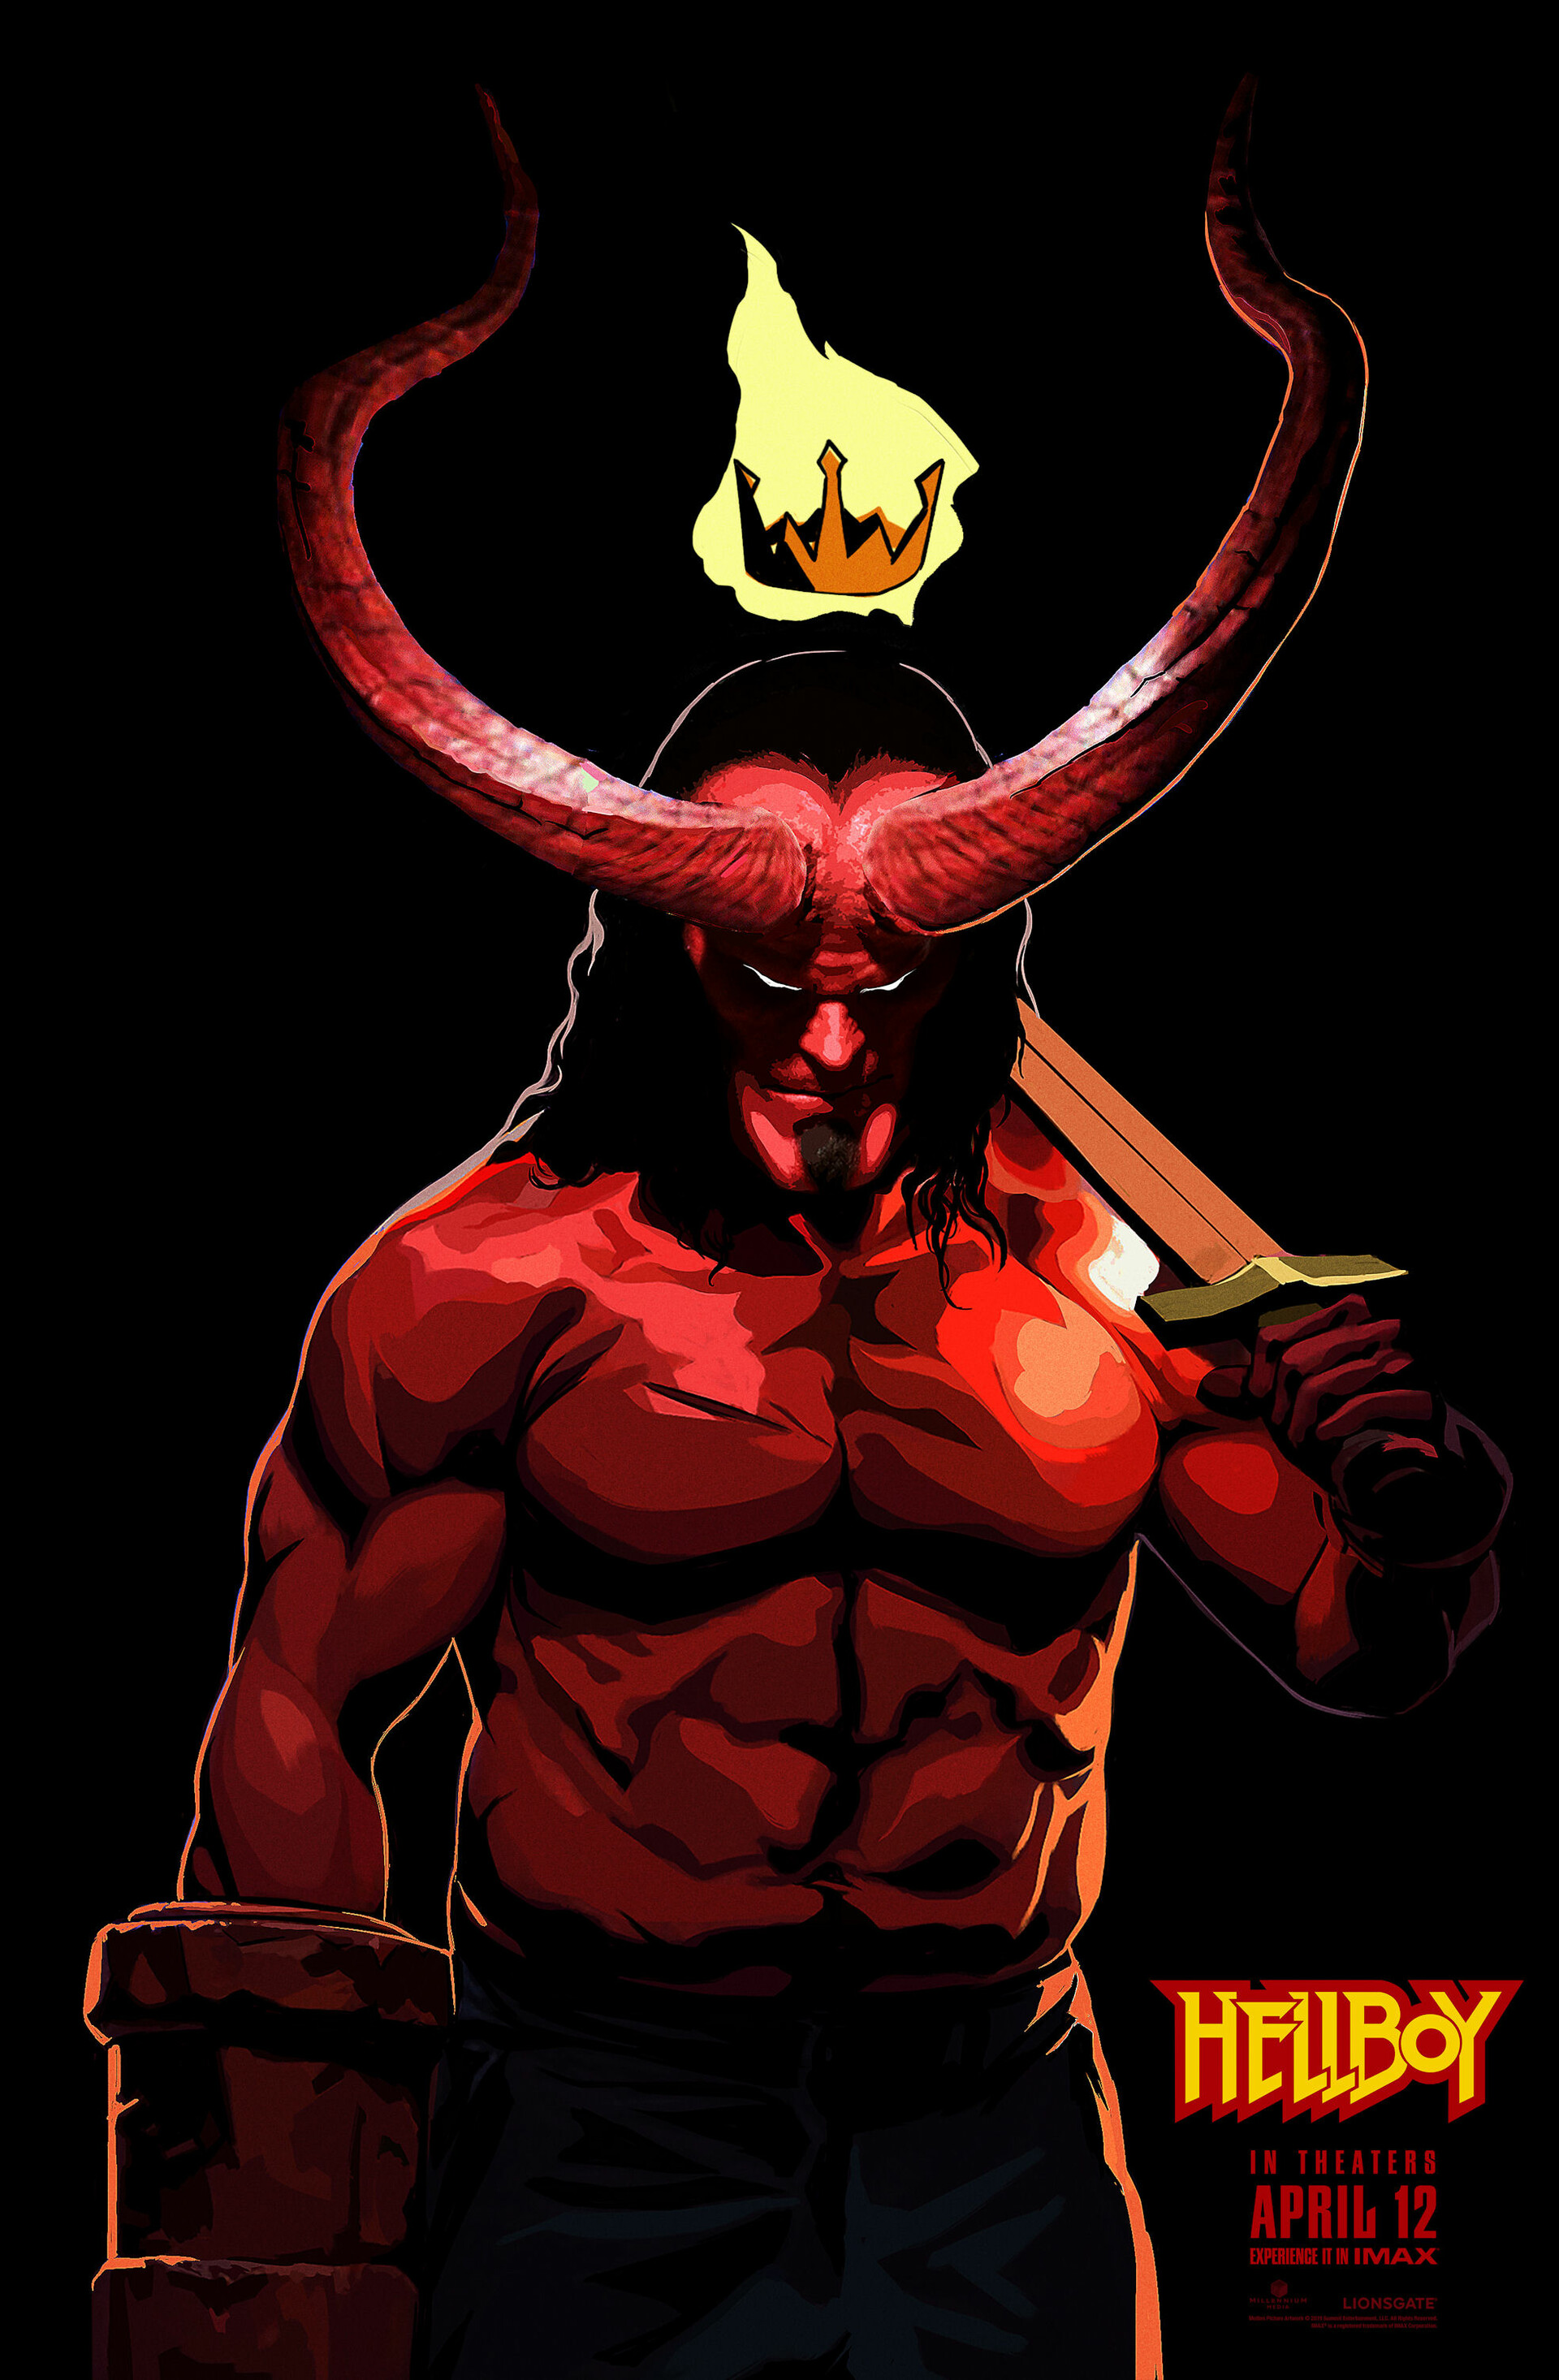 Artstation Hellboy 2019 Film 8 X Official Movie Posters Artwork Epicheroes Exclusive Epic Heroes